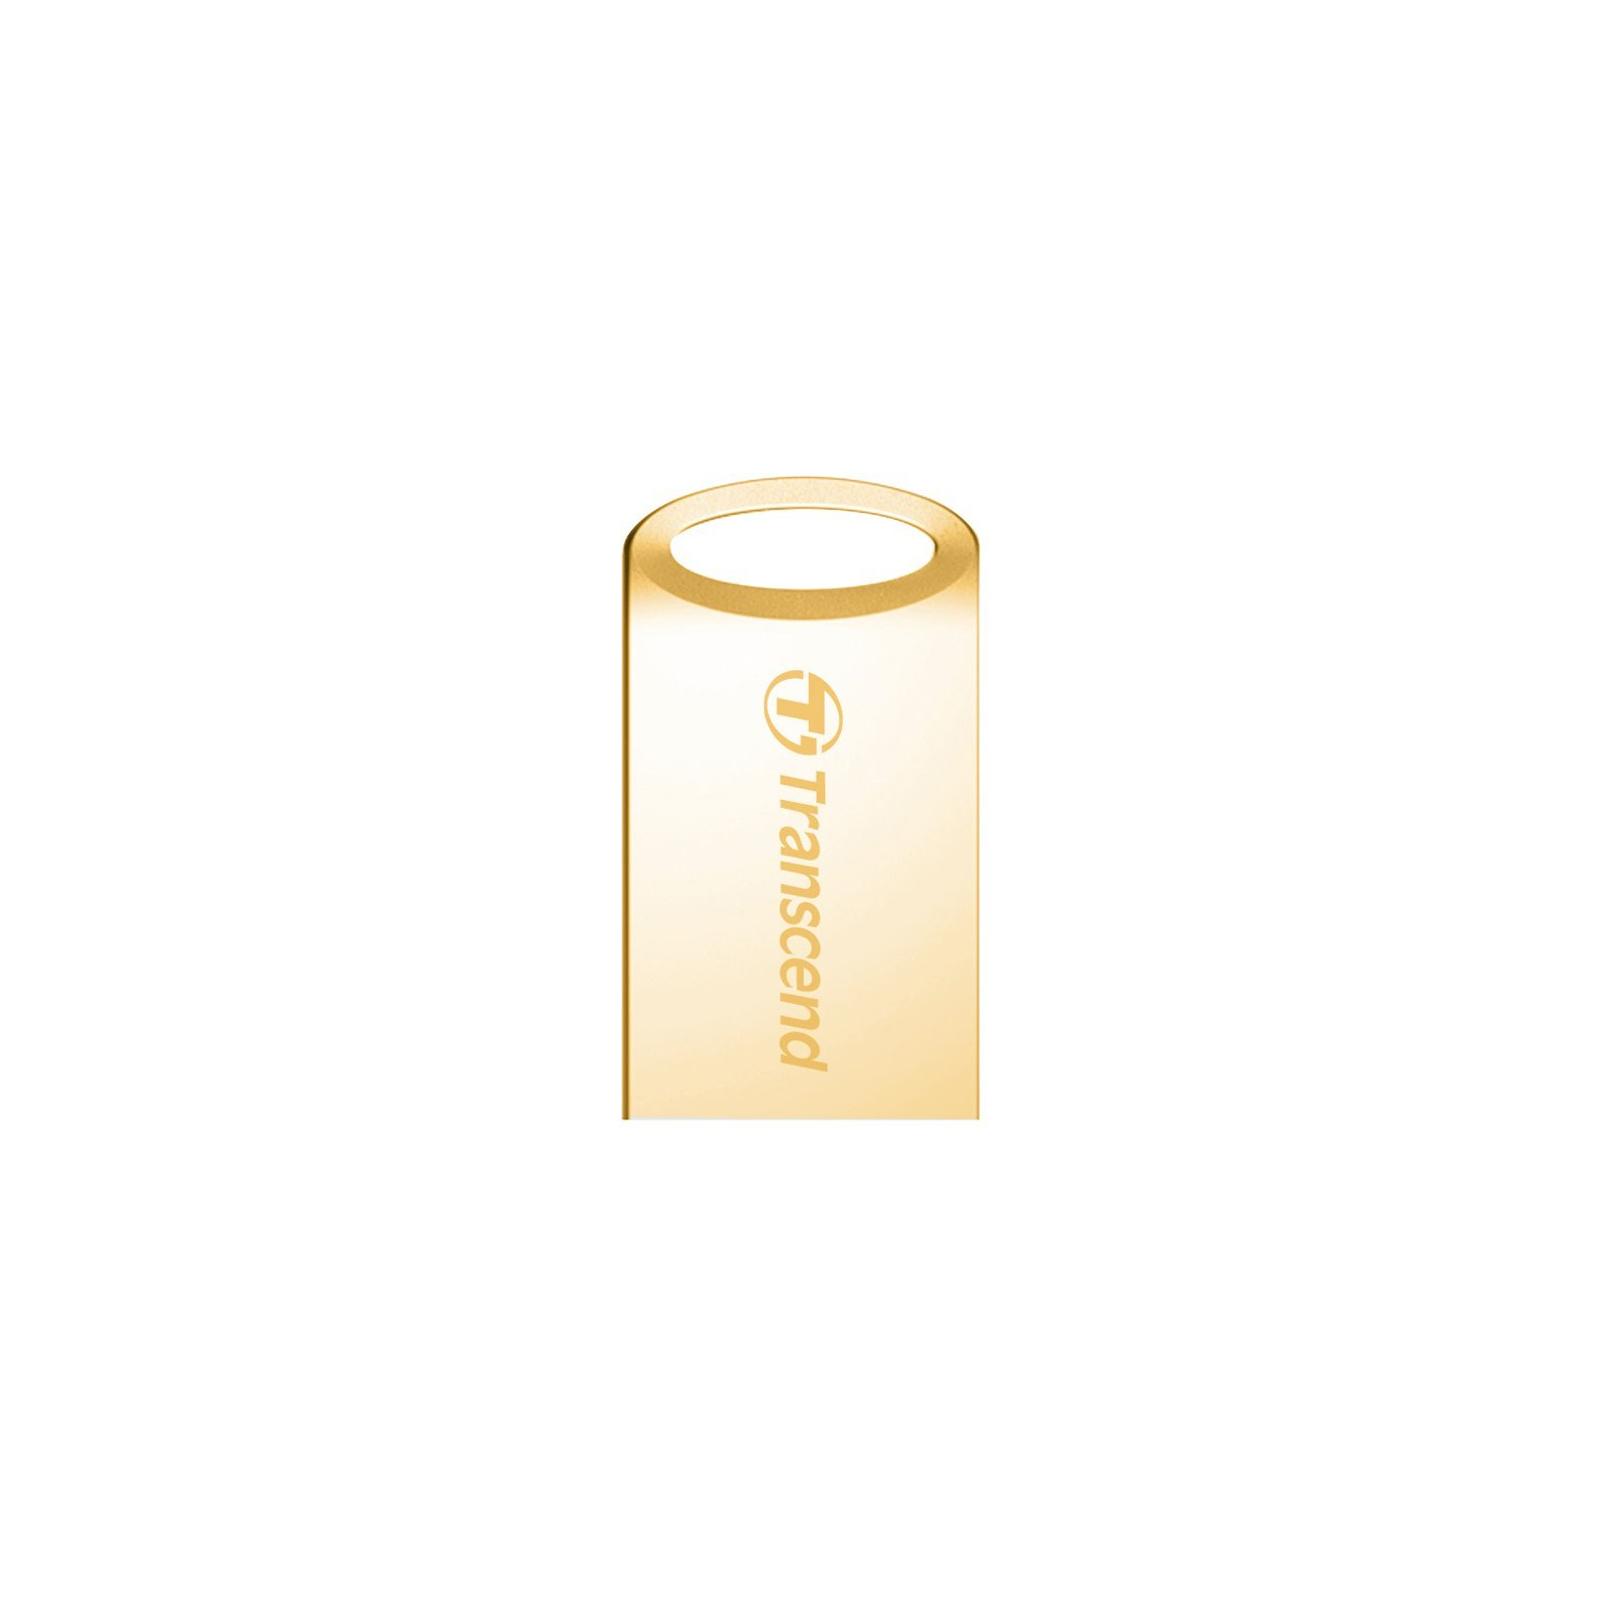 USB флеш накопитель Transcend JetFlash 510, Gold Plating (TS16GJF510G)